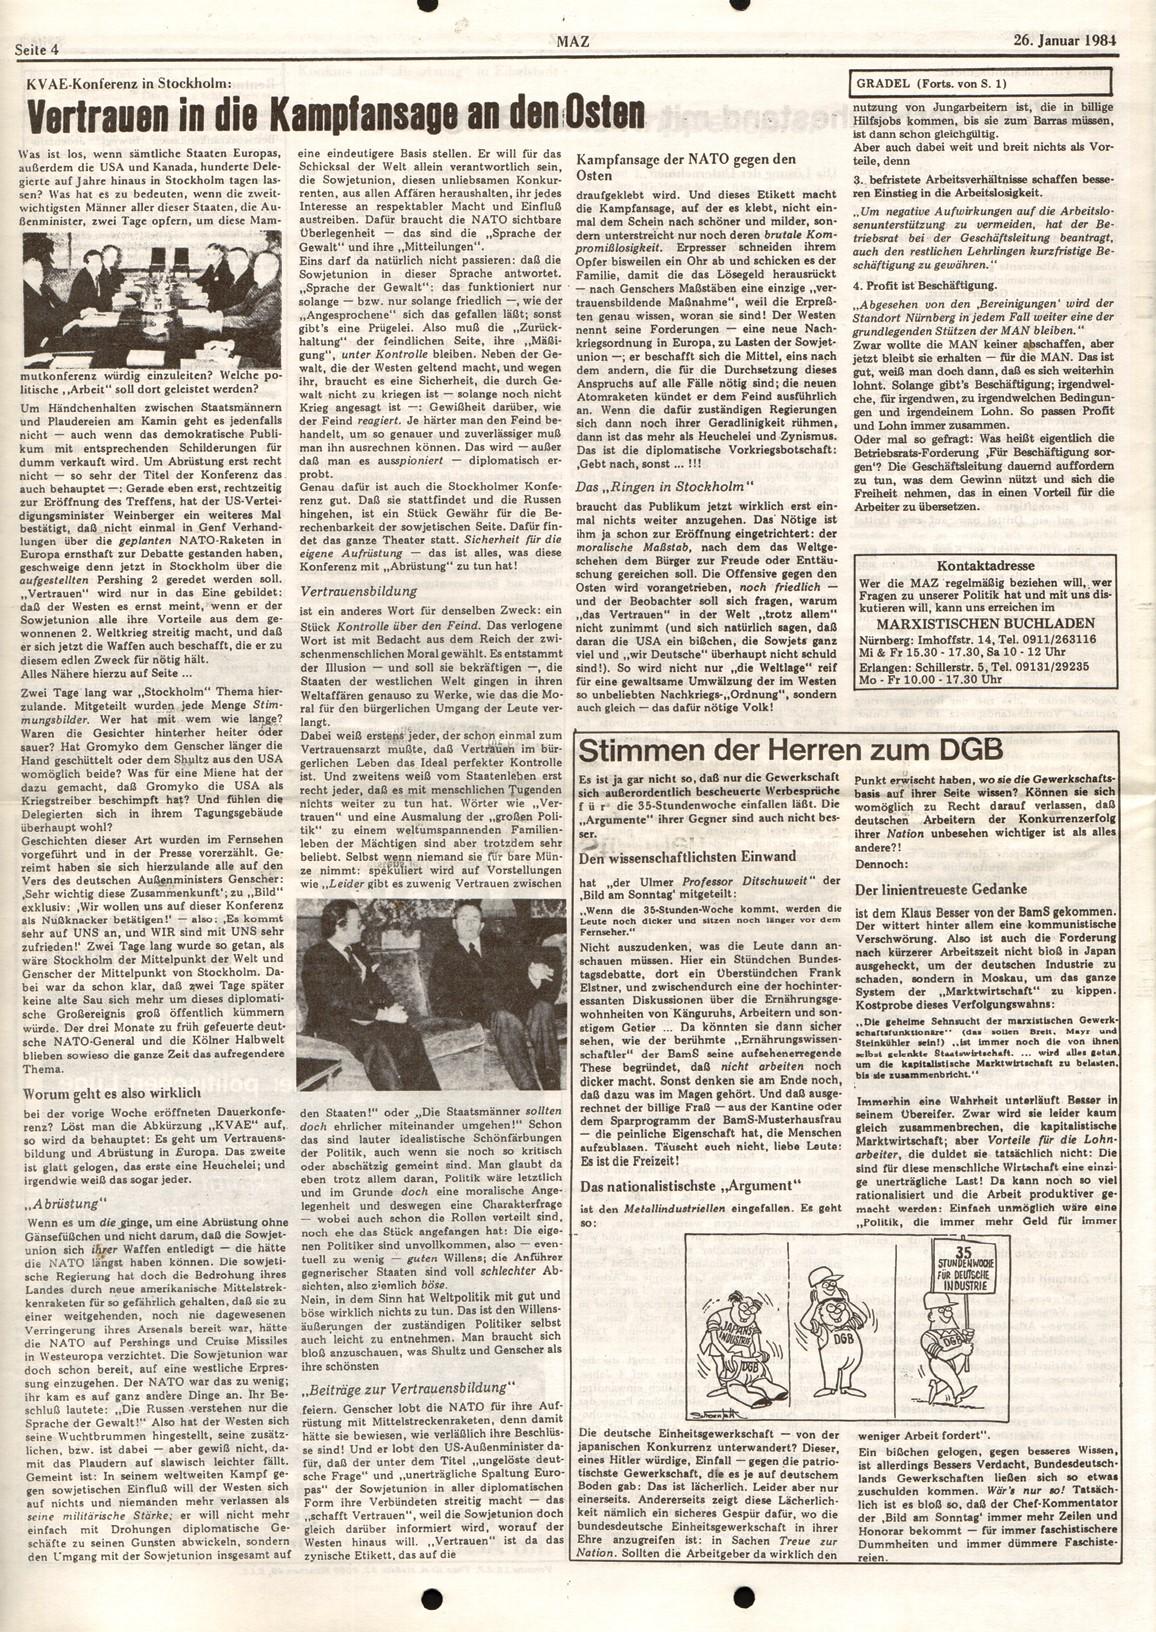 Nuernberg_MG_MAZ_MAN_19840126_04